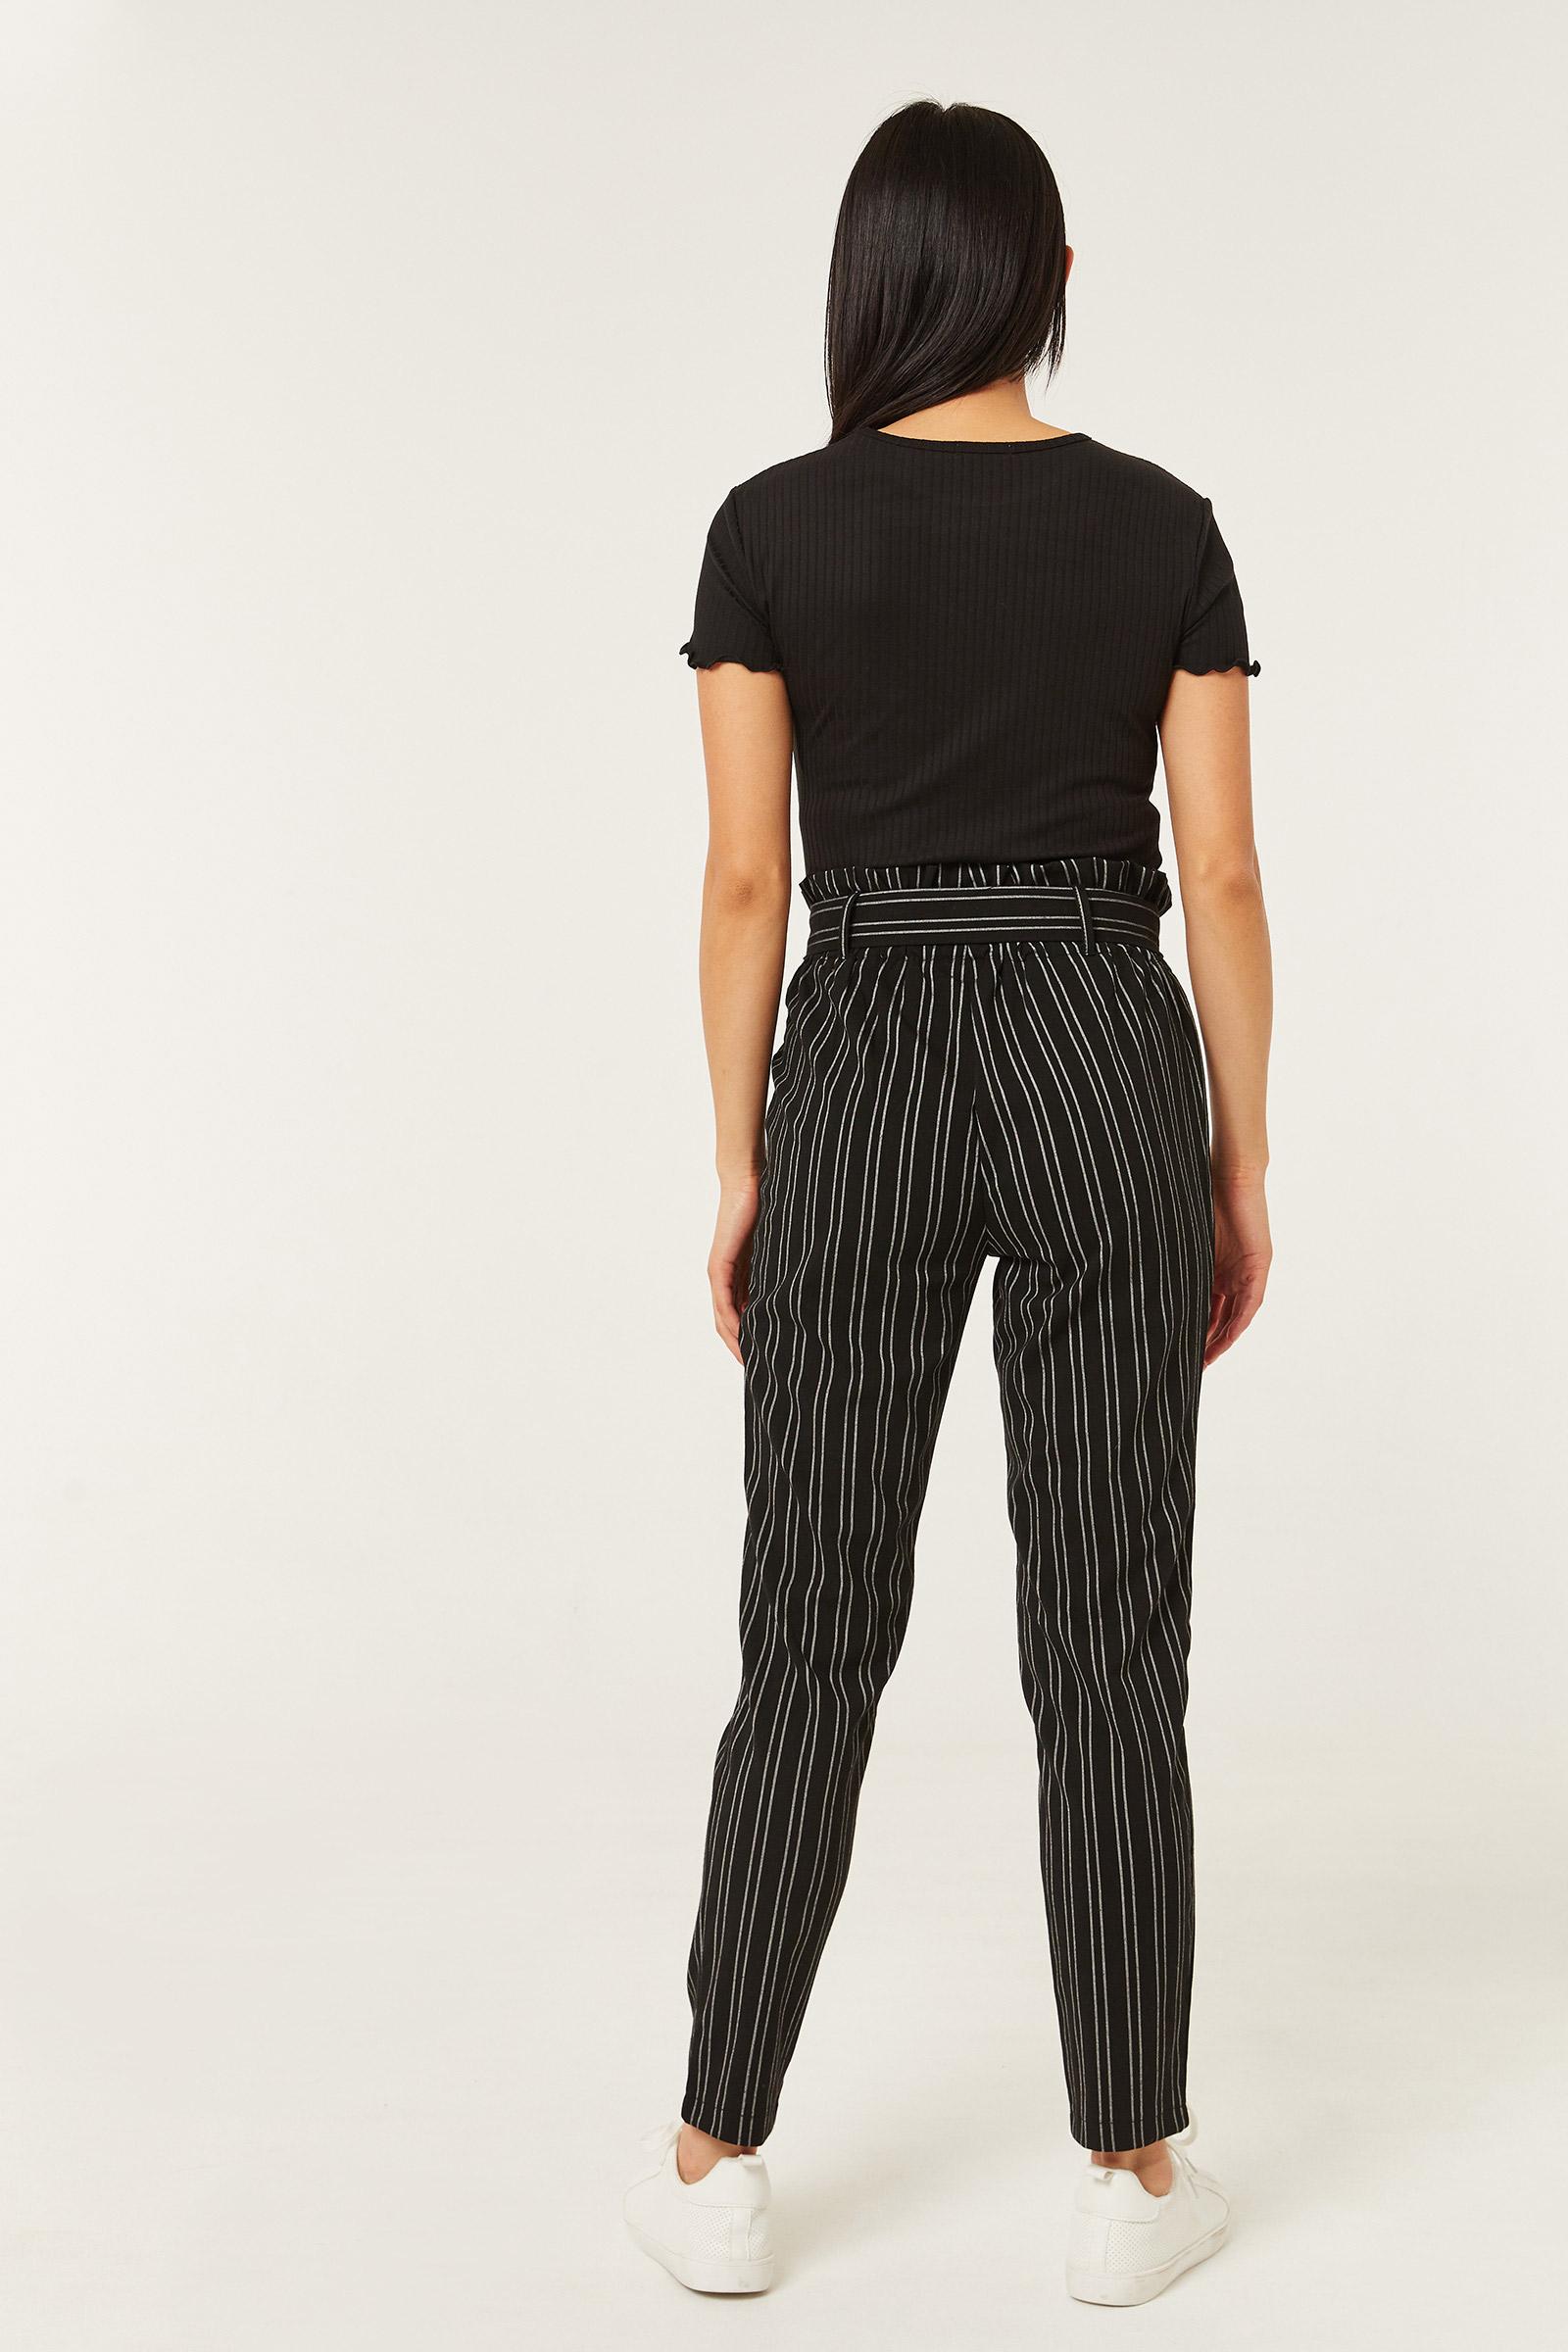 Belted Paper Bag Striped Pants